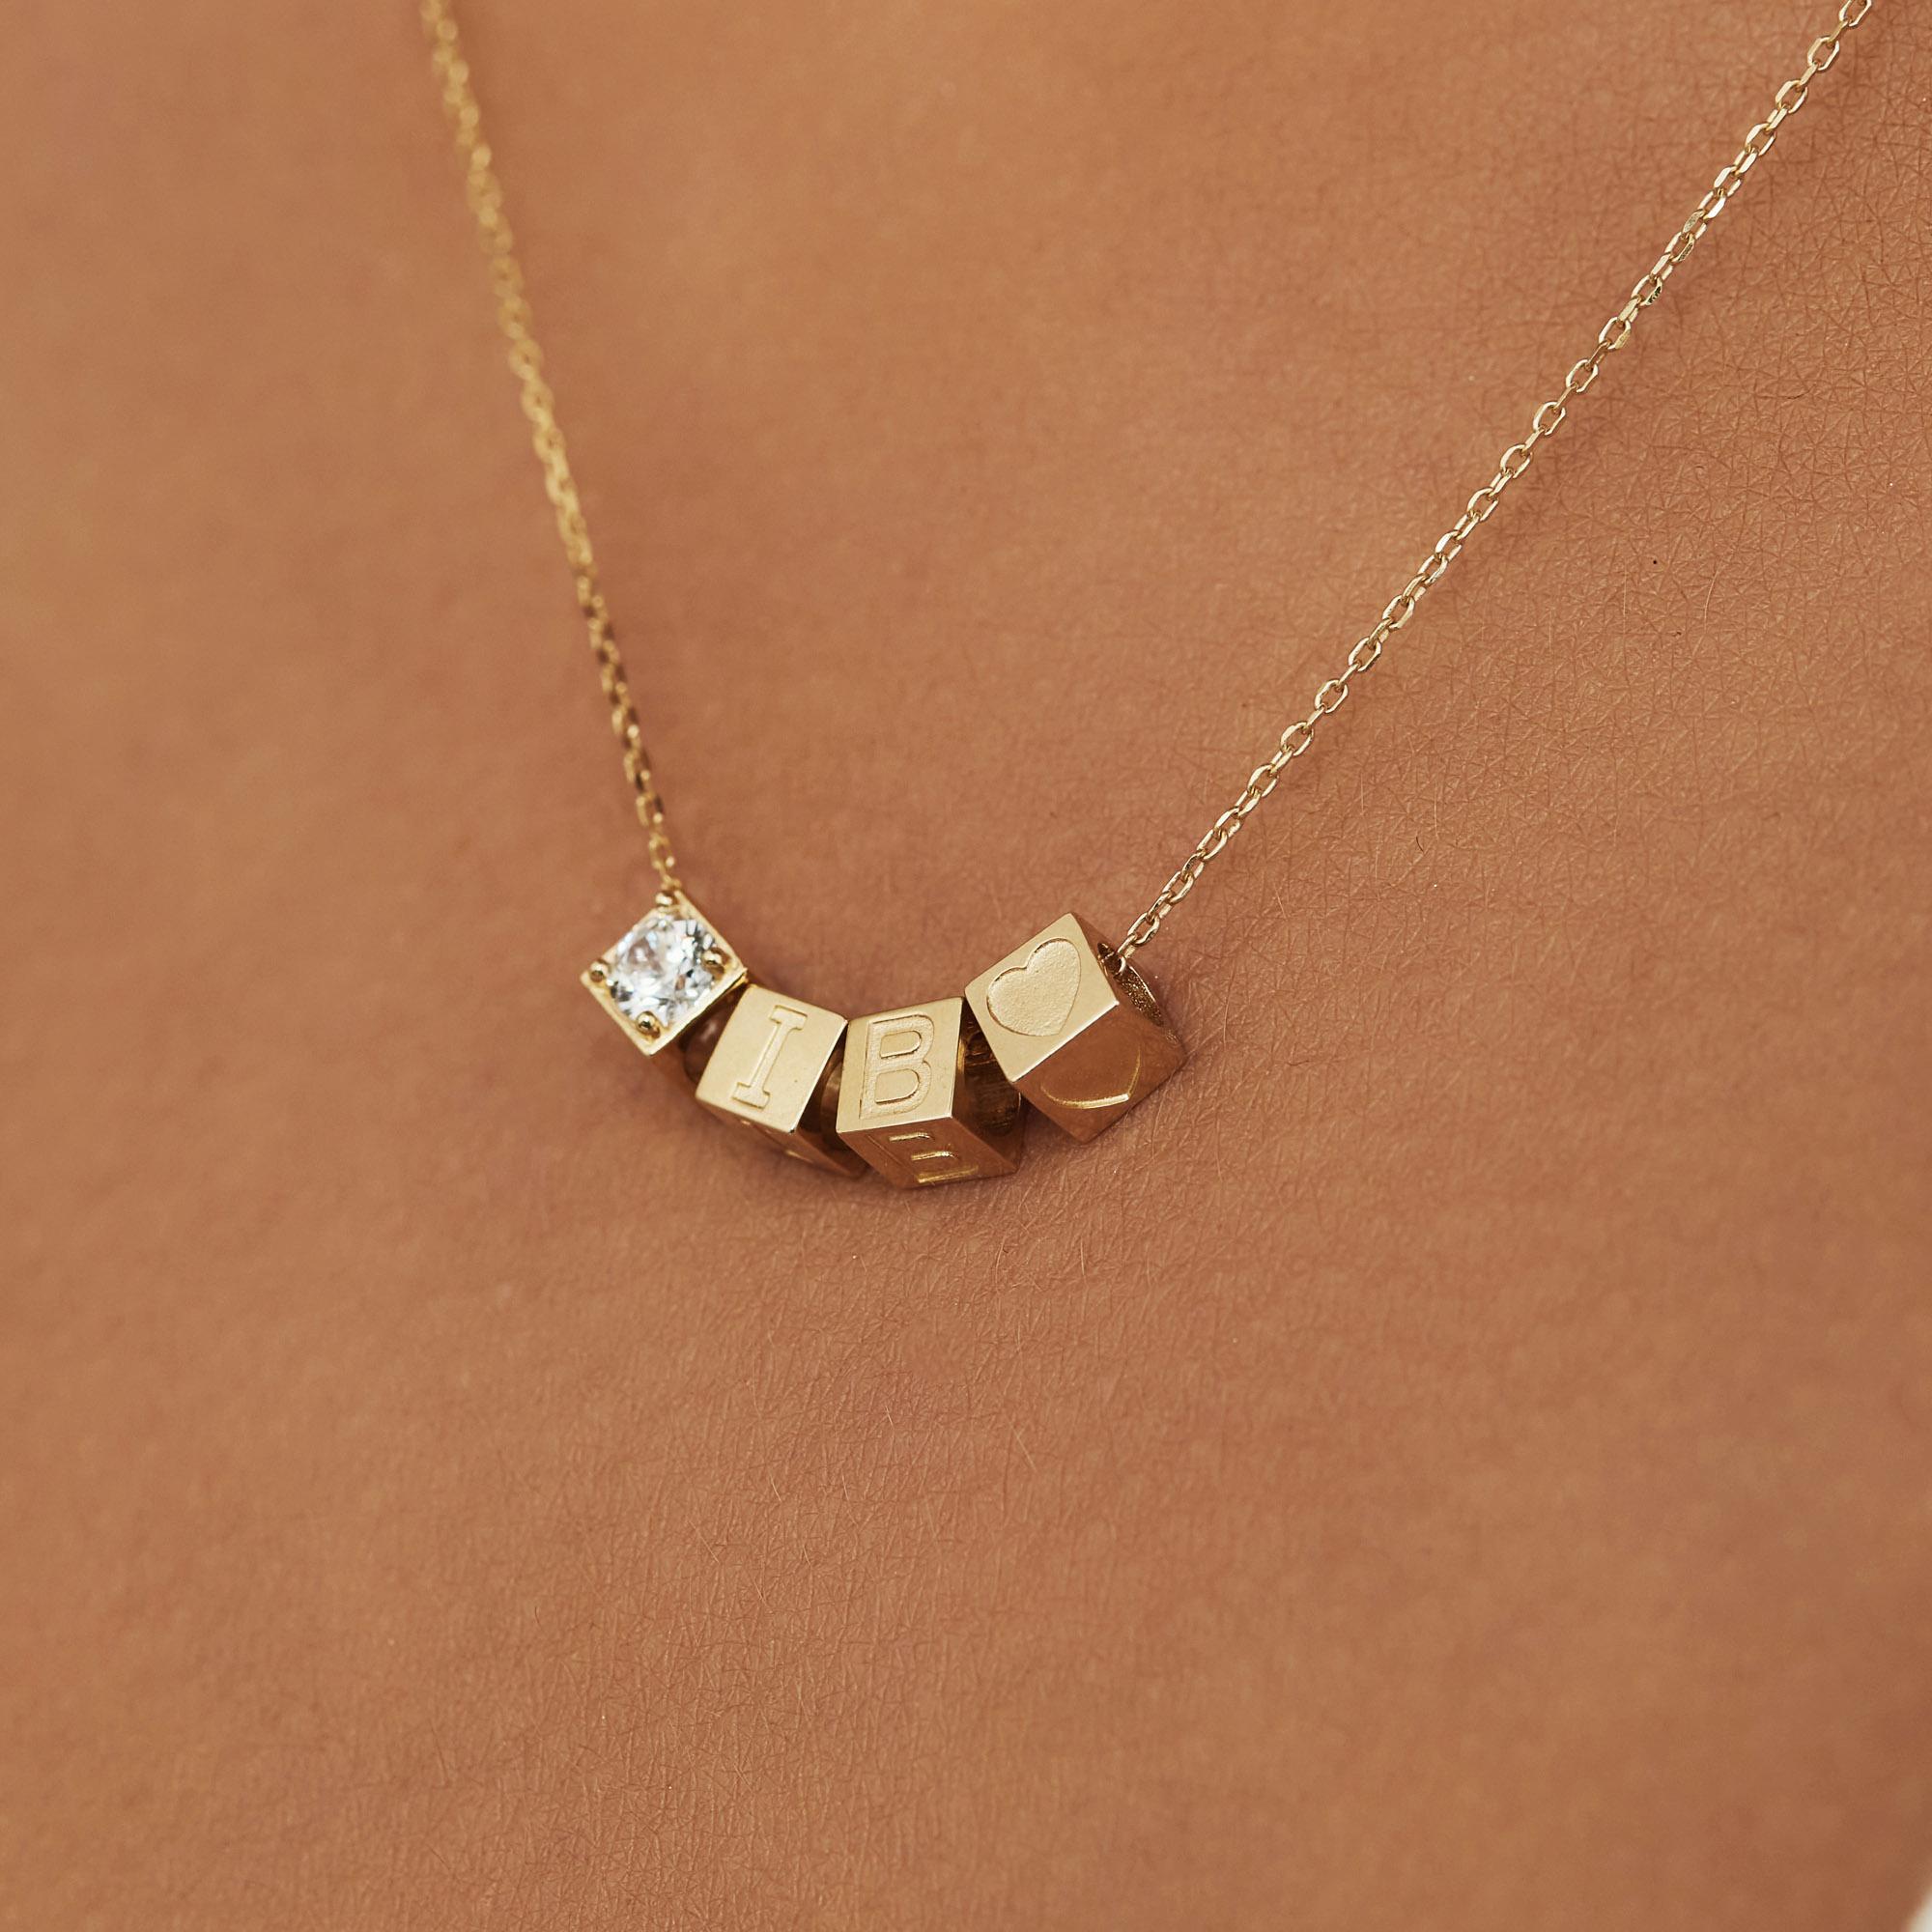 Isabel Bernard Le Carré Felie 14 karat gold cube charm with zirconia